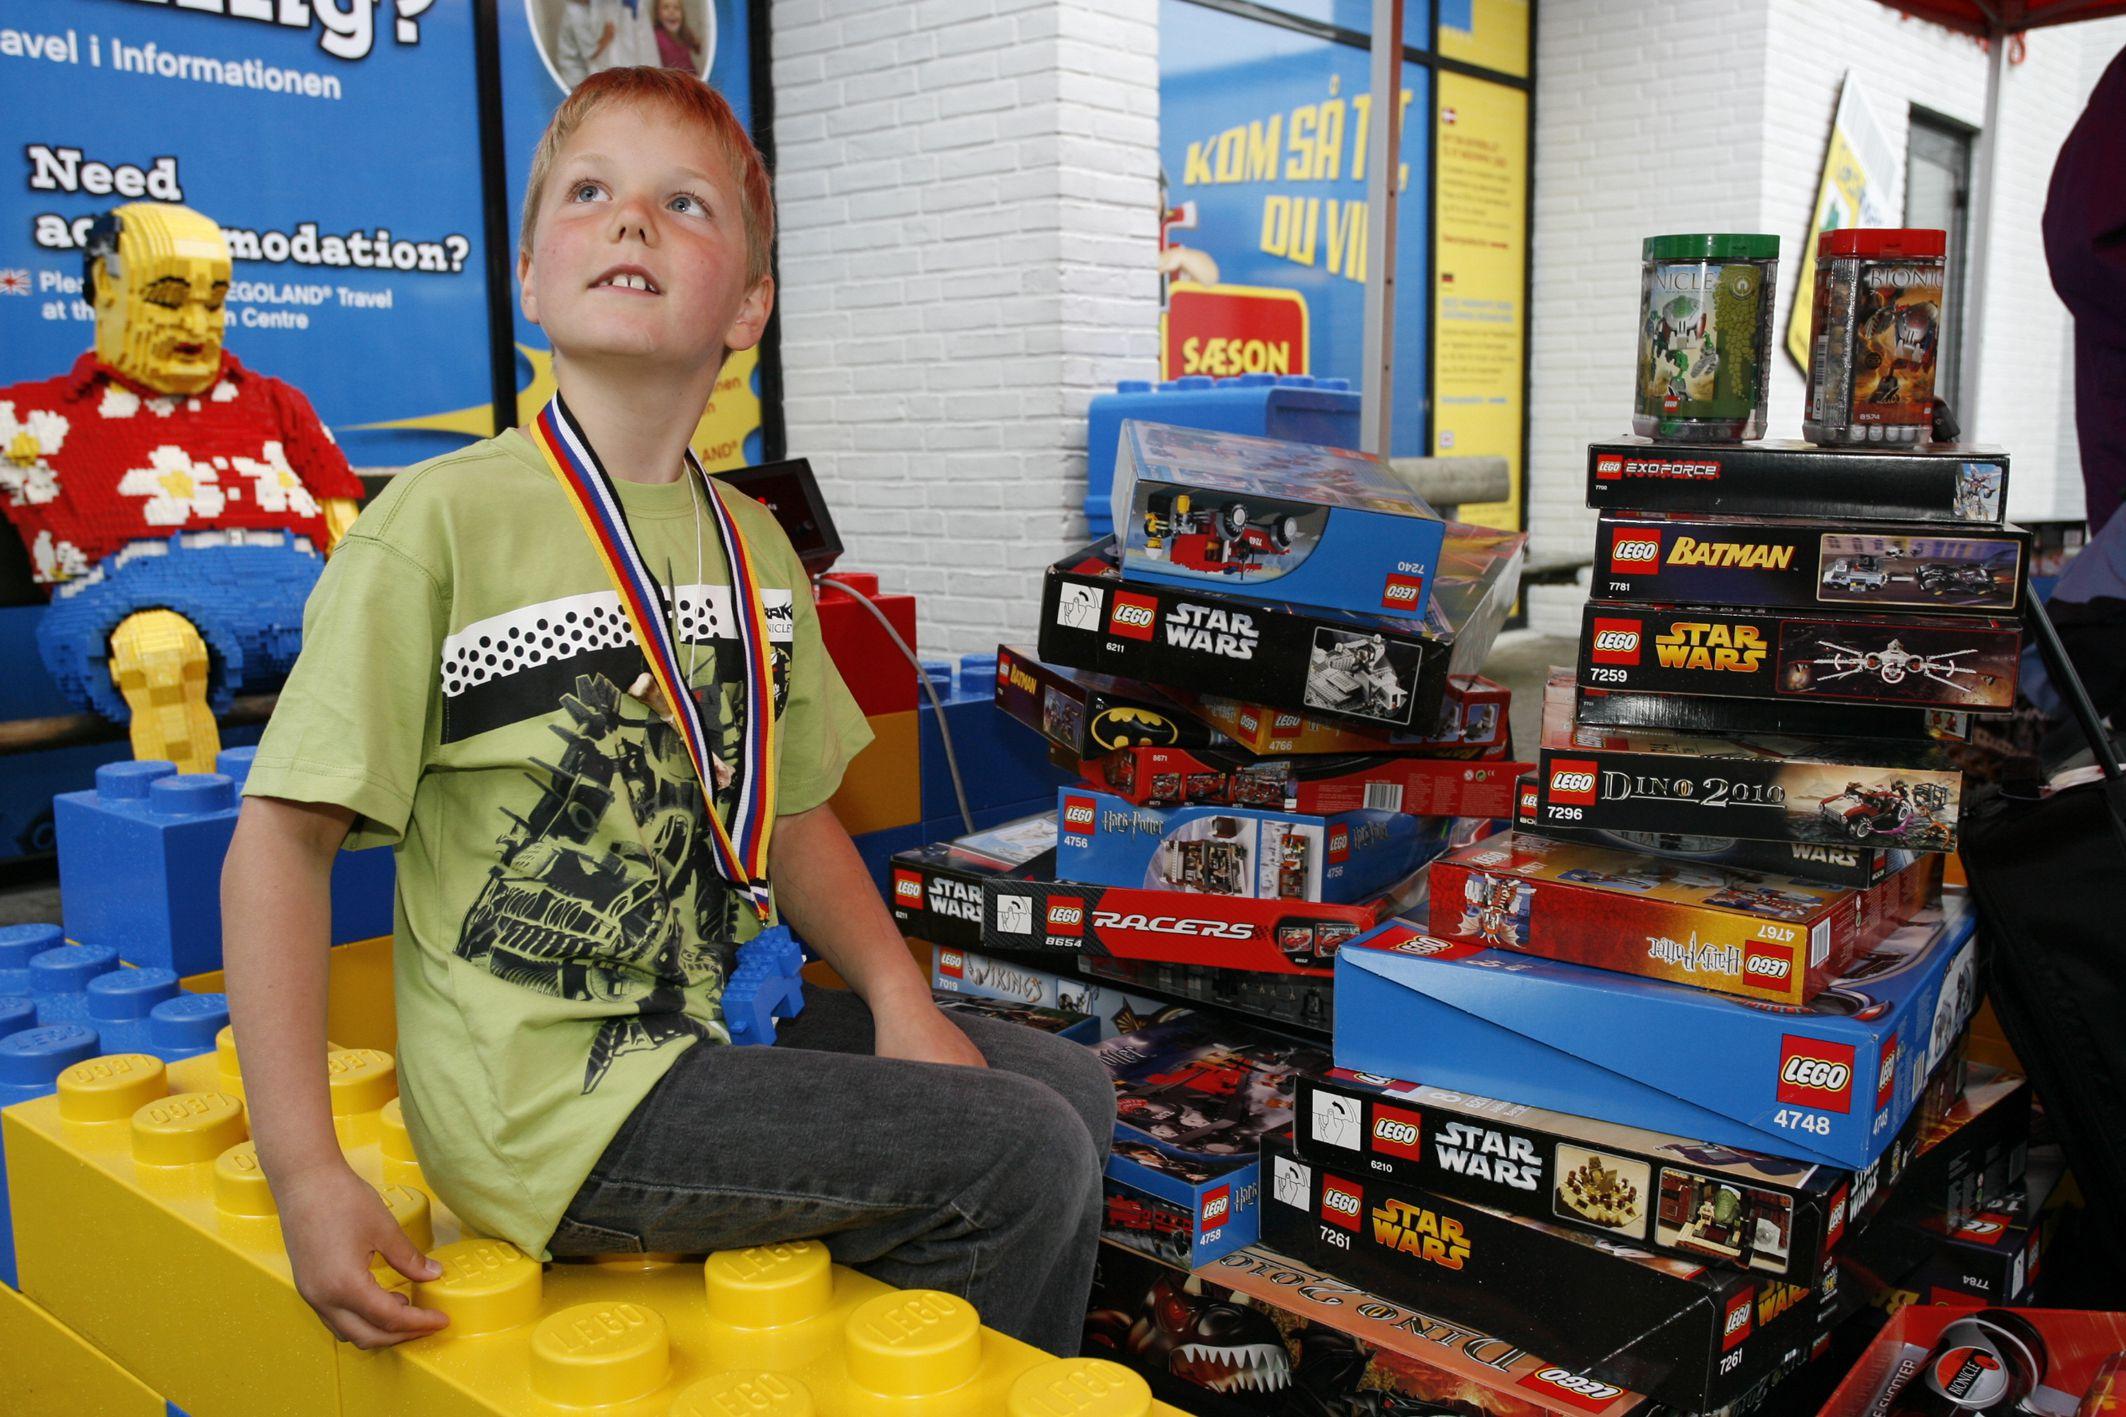 Legolund in Billund, Denmark - The Original Legoland